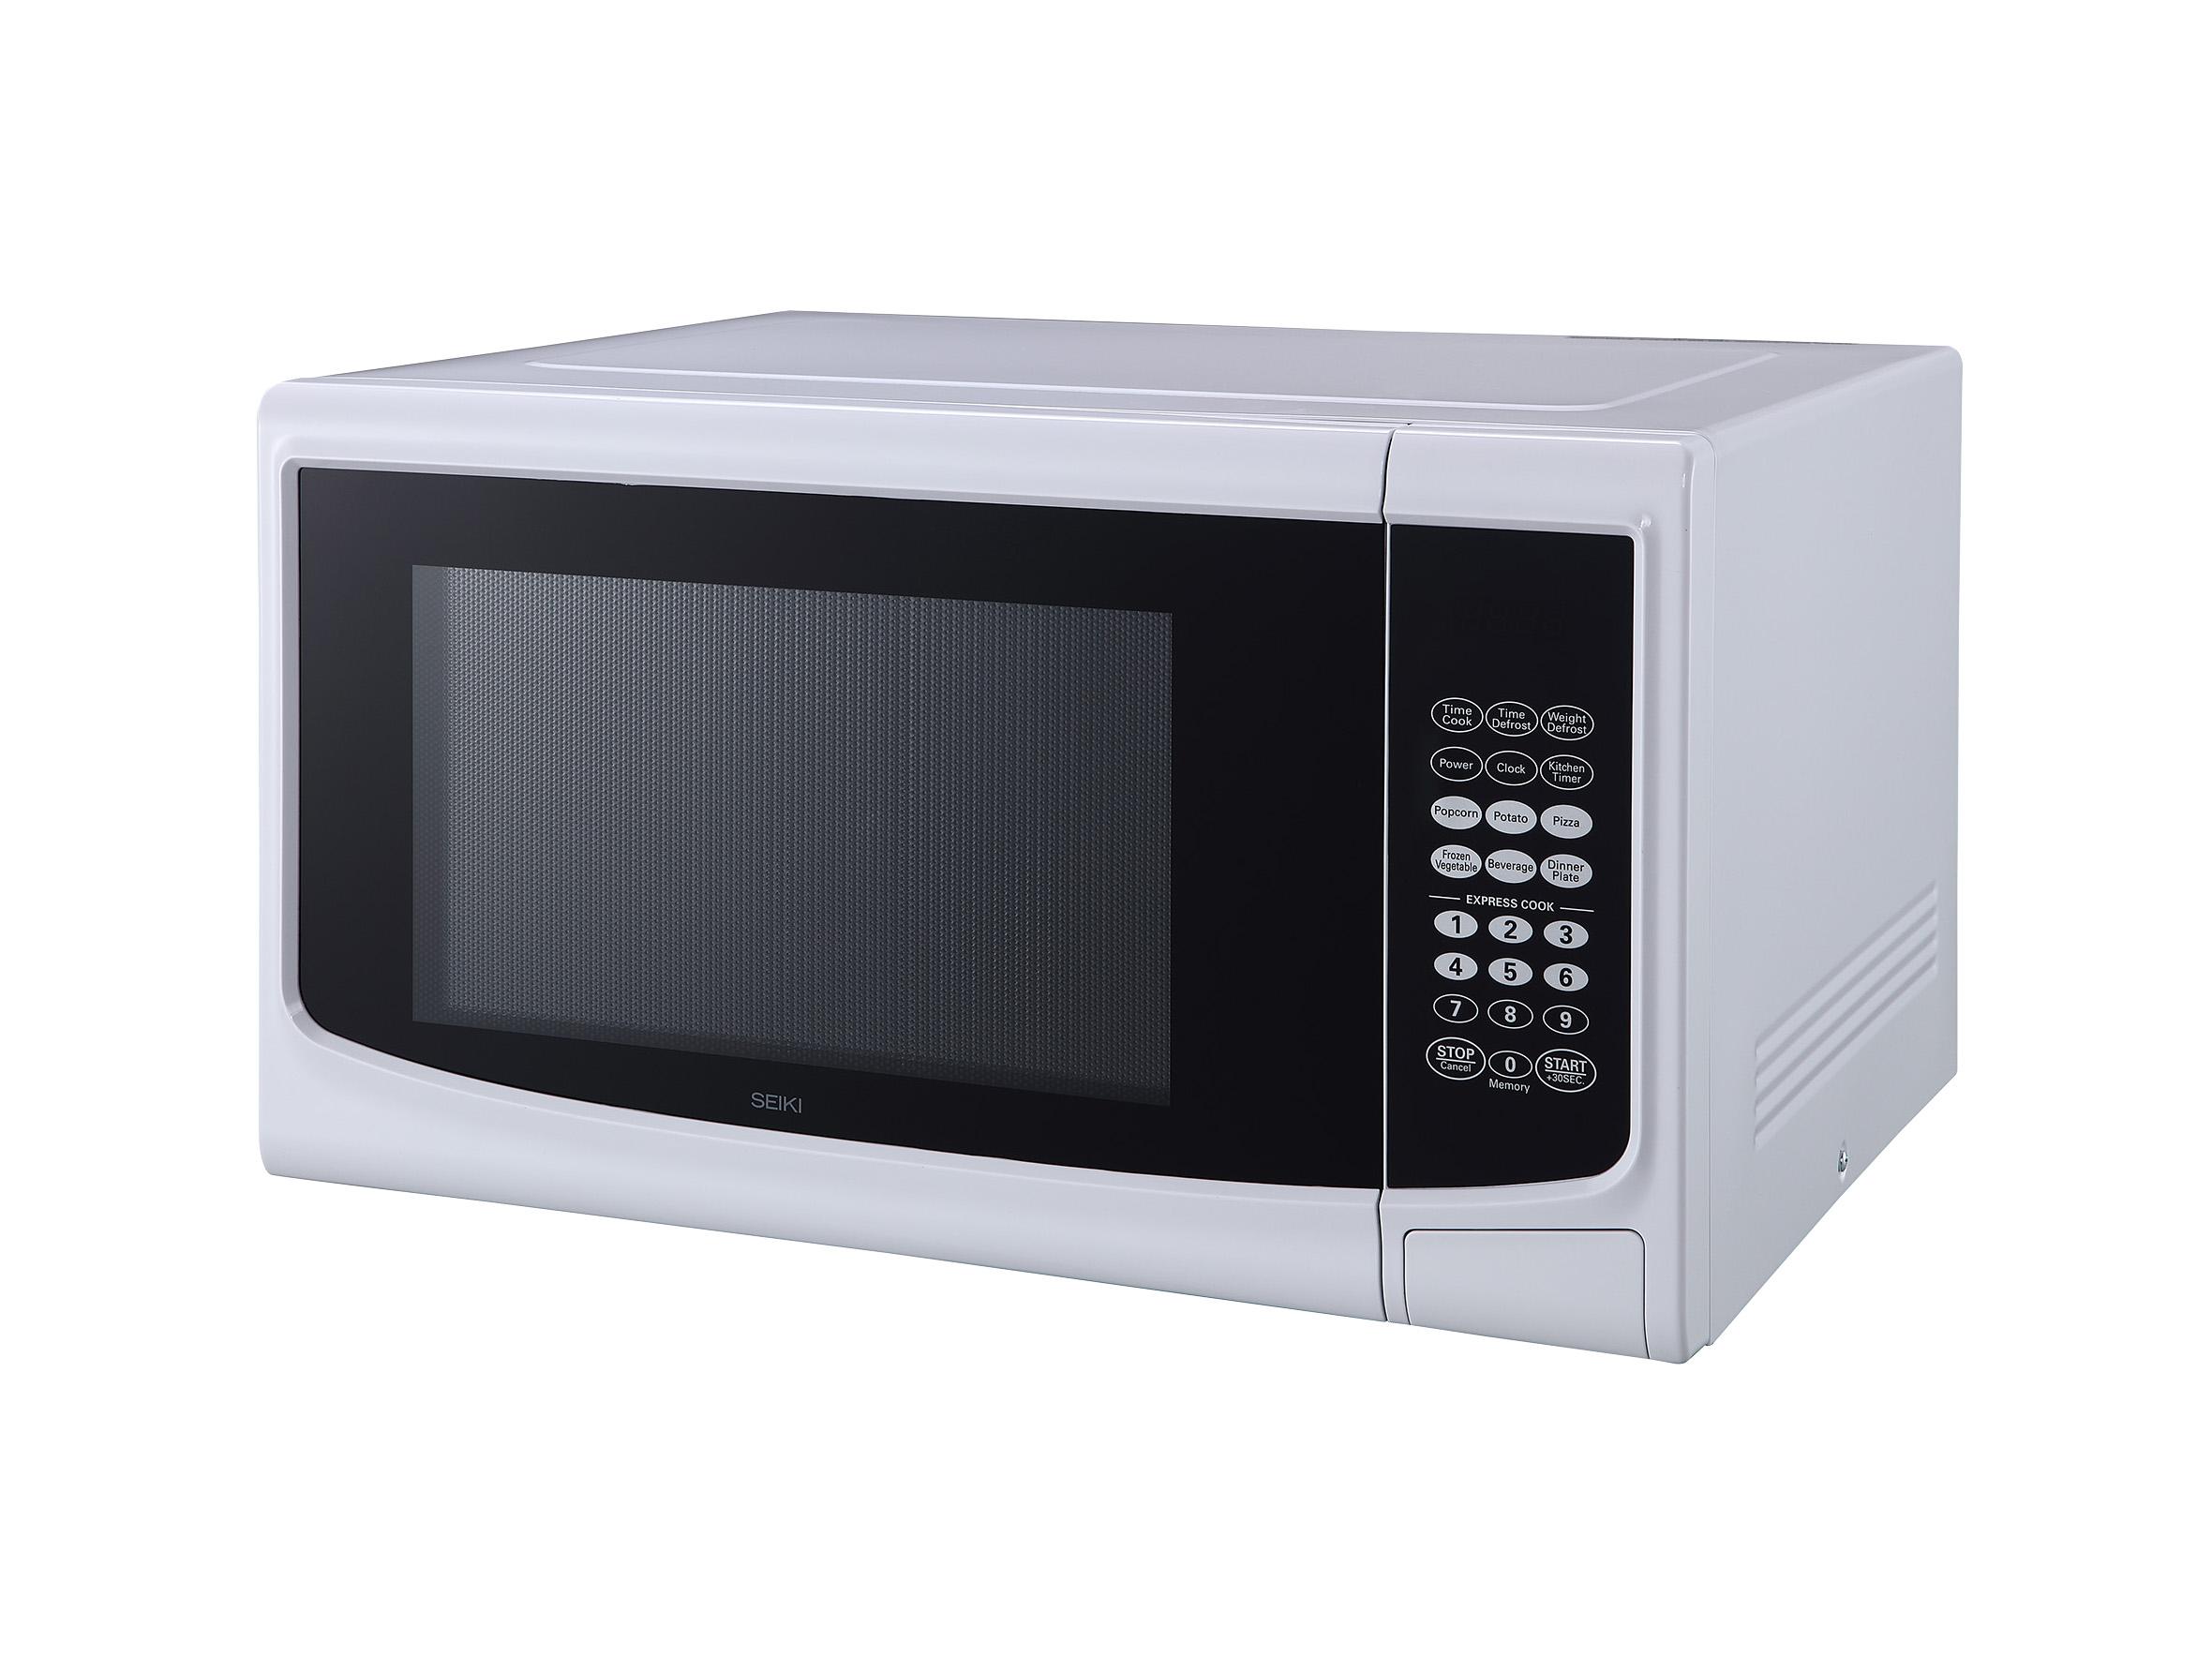 SC-4200MV - 1